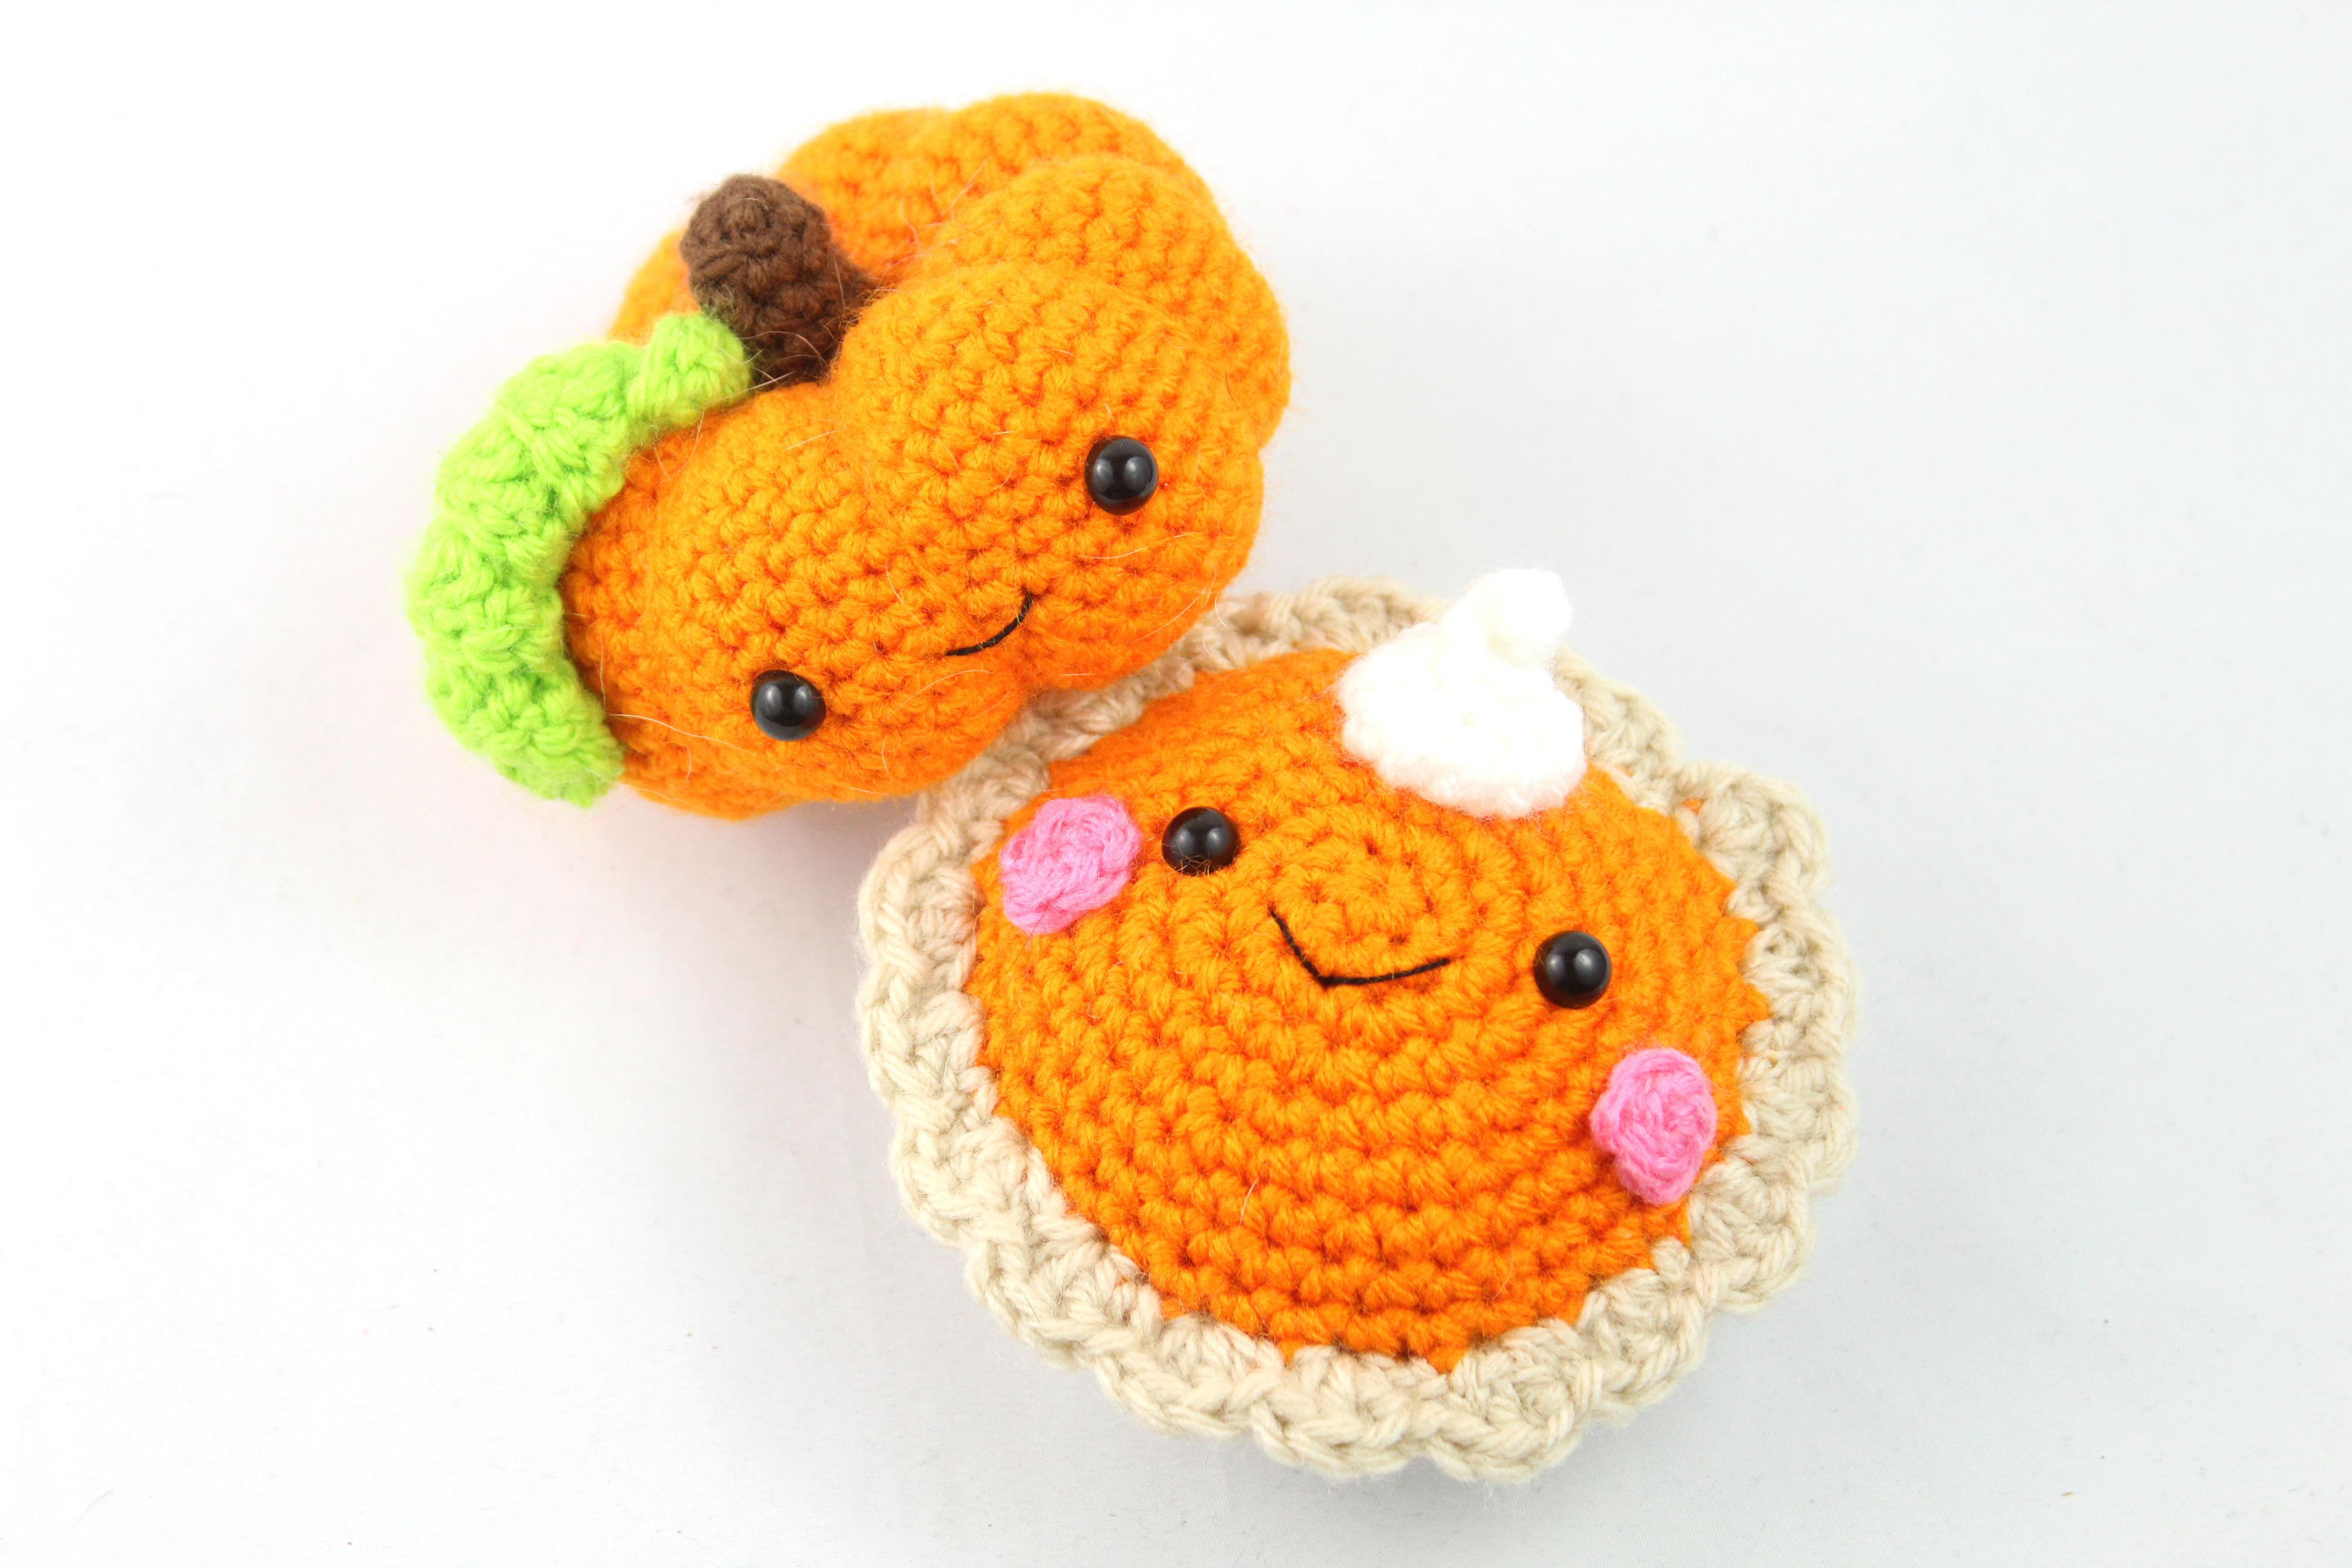 Amigurumi Pumpkin pattern by Eden Dintsikos - Ravelry | 2667x4000